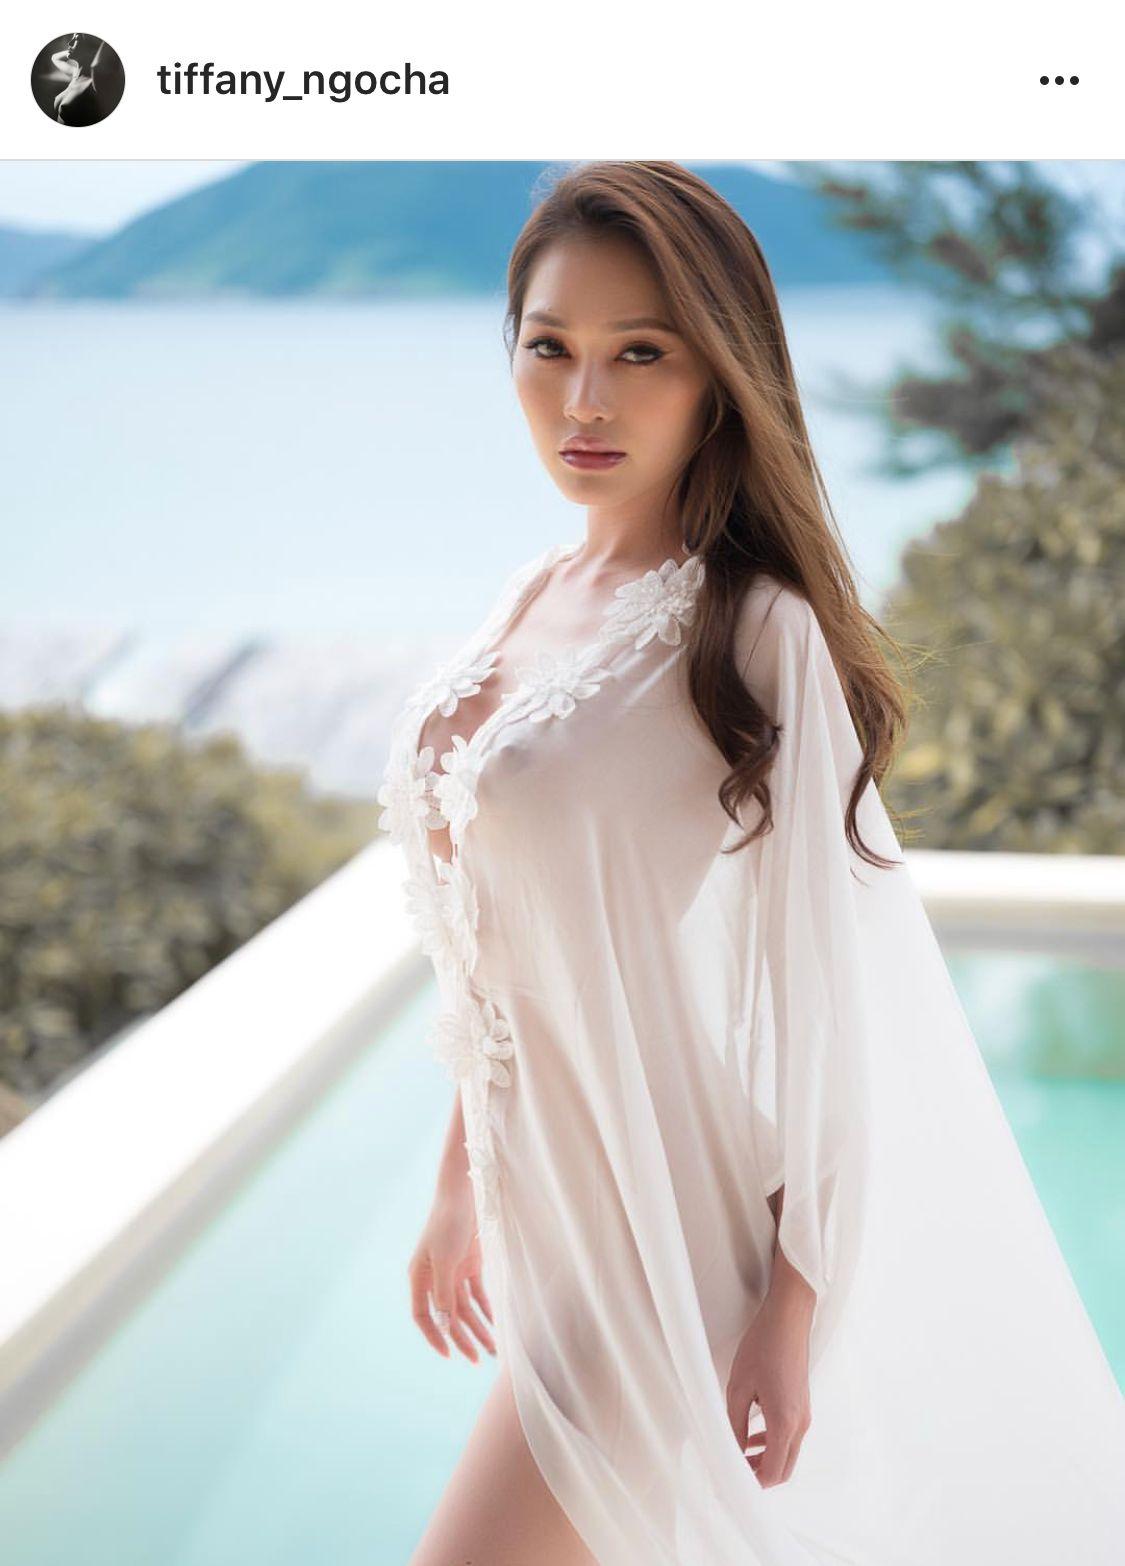 Pin Van Jan Hermkes Op Chinese - Sexy, Asian Beauty En -3688